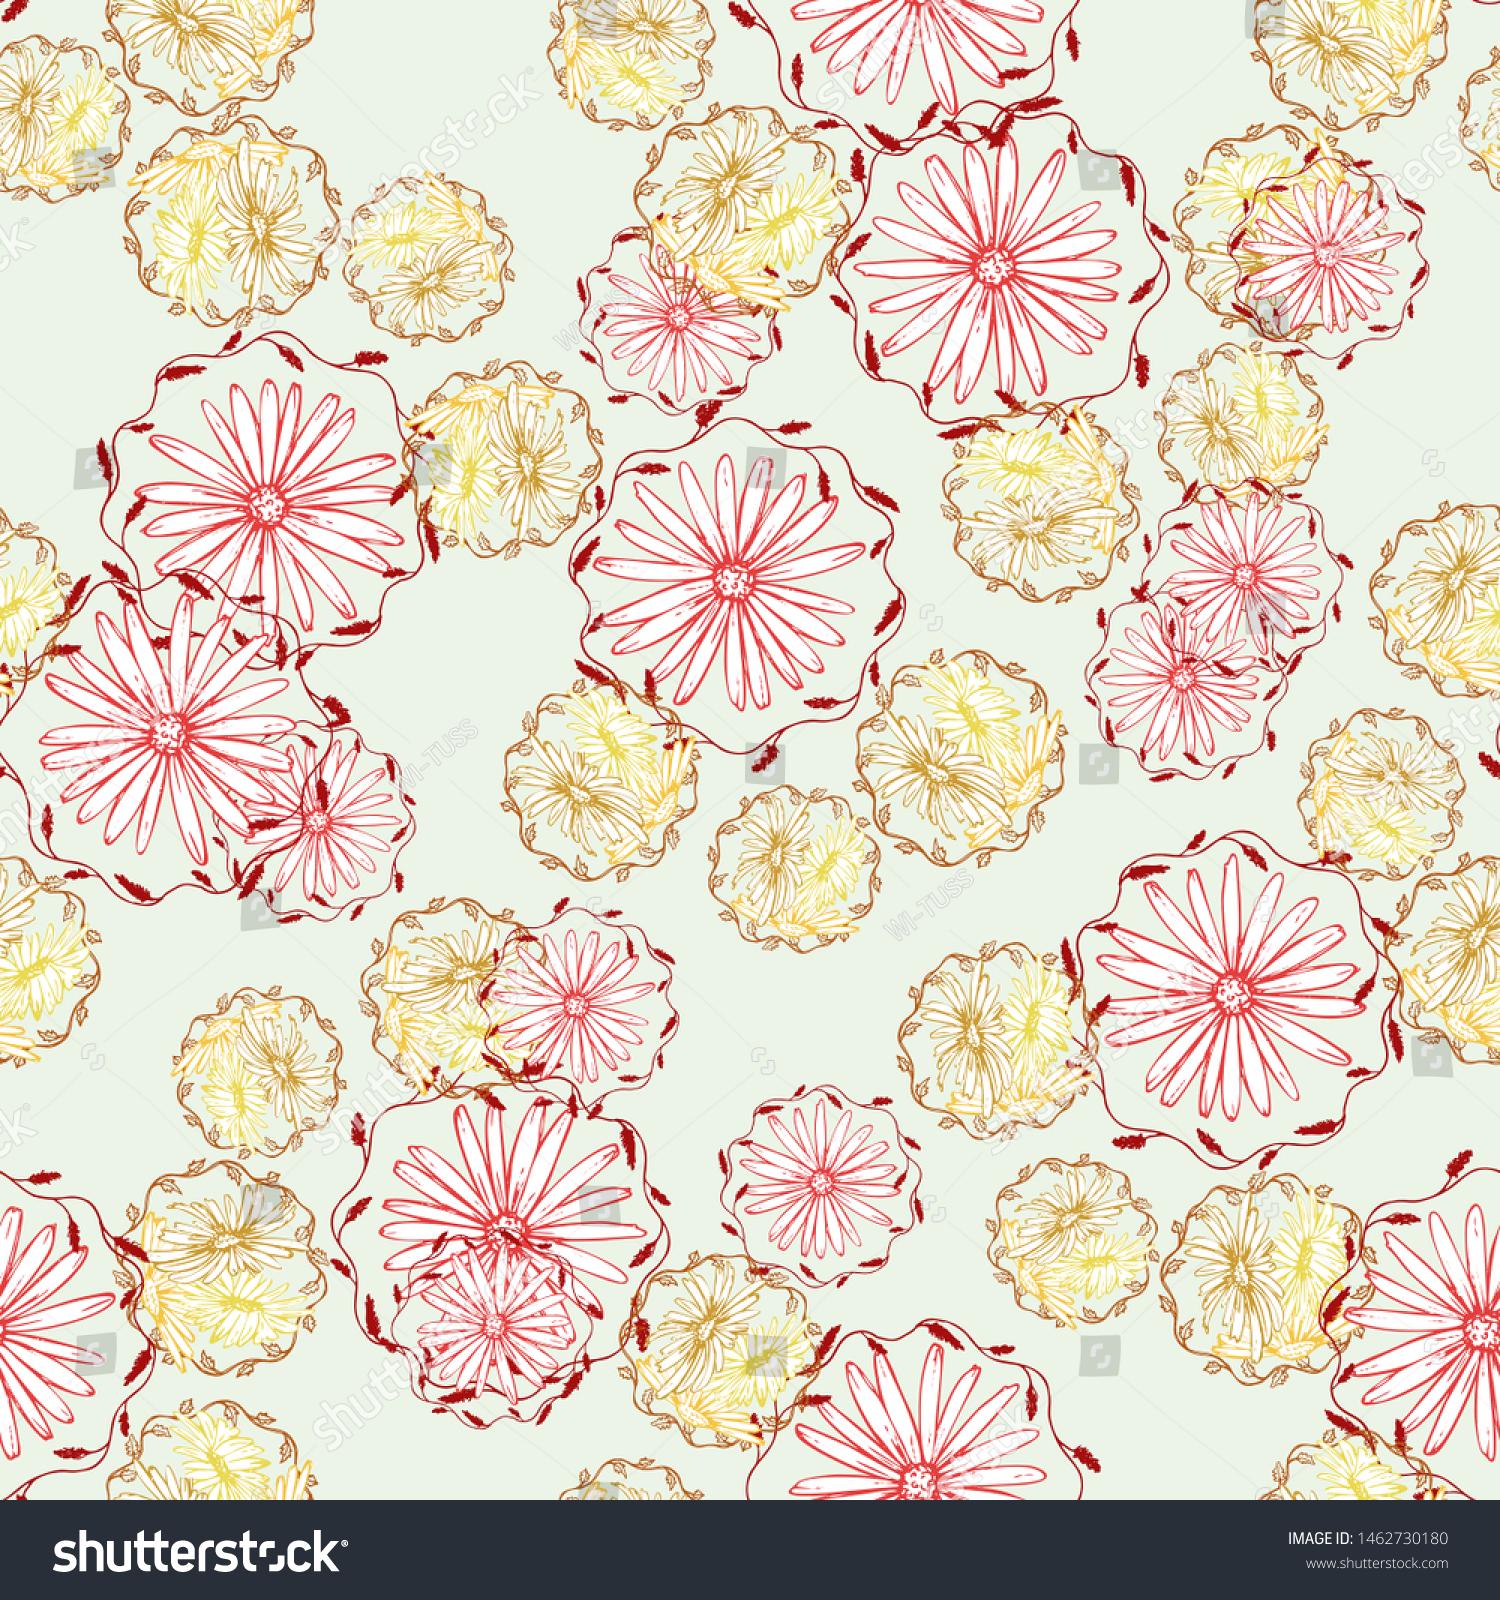 Retro Collection Fabric Wallpapercolorful Color Artsy Stock Vector